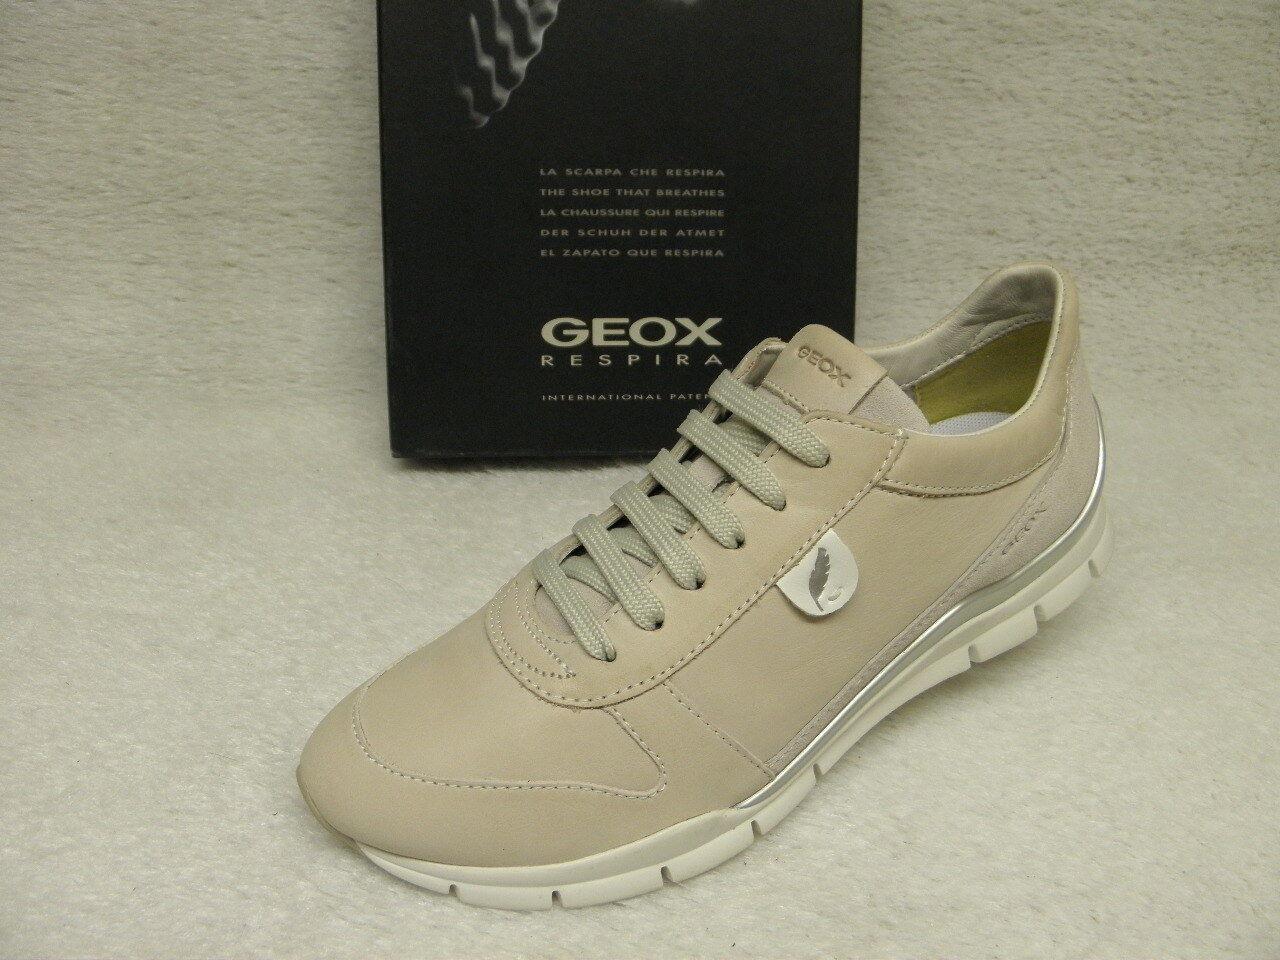 Scarpe Geox ® riduce finora  GRATIS Premium-CALZE (z221)